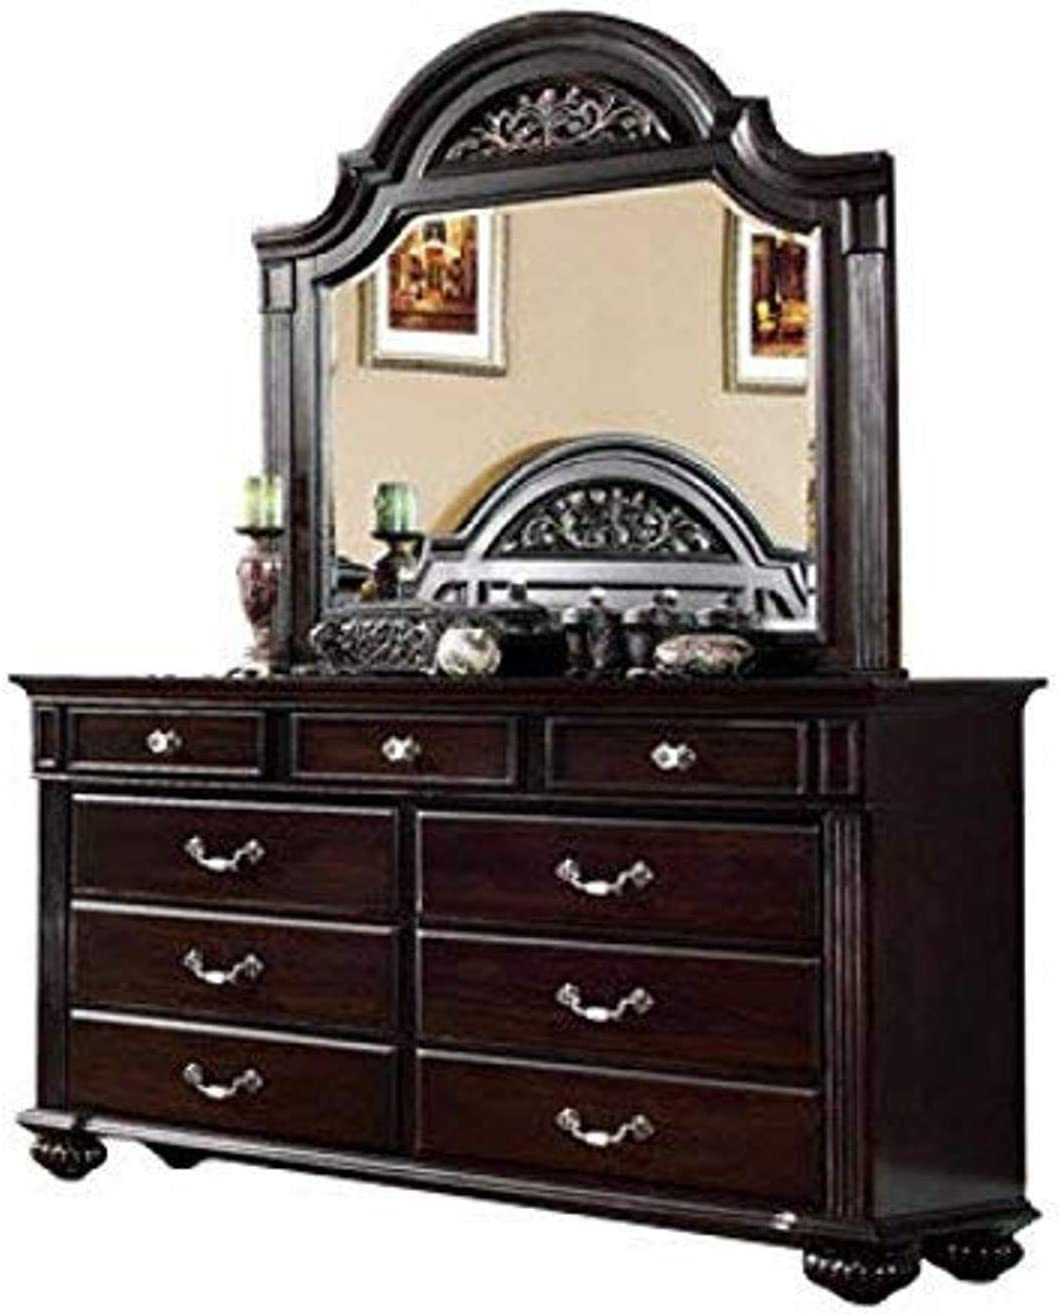 Furniture of America Dresser, Dark Walnut